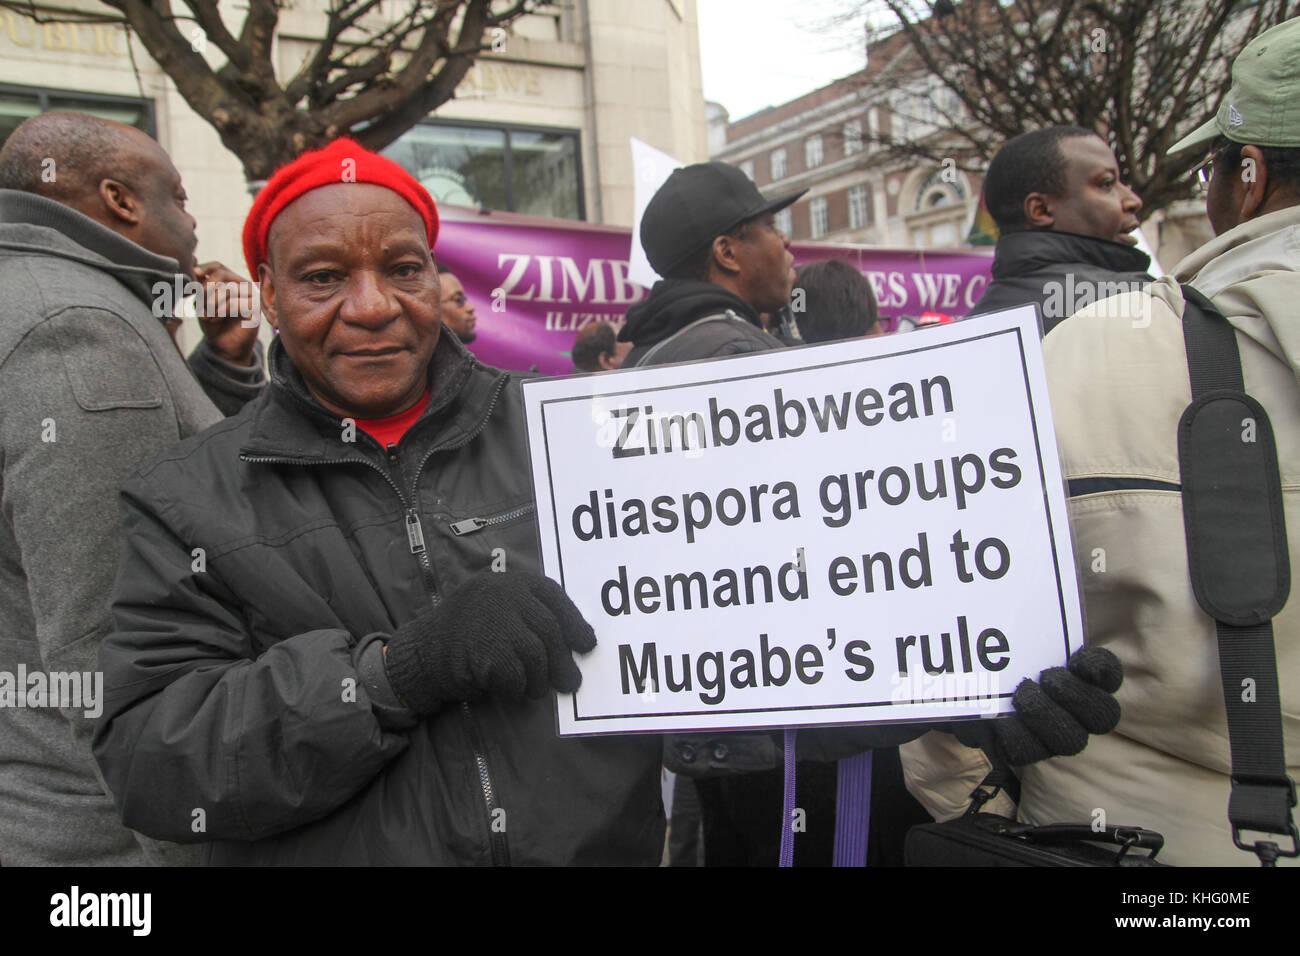 London, UK. 21 February 2015: Hundreds of Zimbabwean demonstrators take part in a demonstration outside Zimbabwe - Stock Image